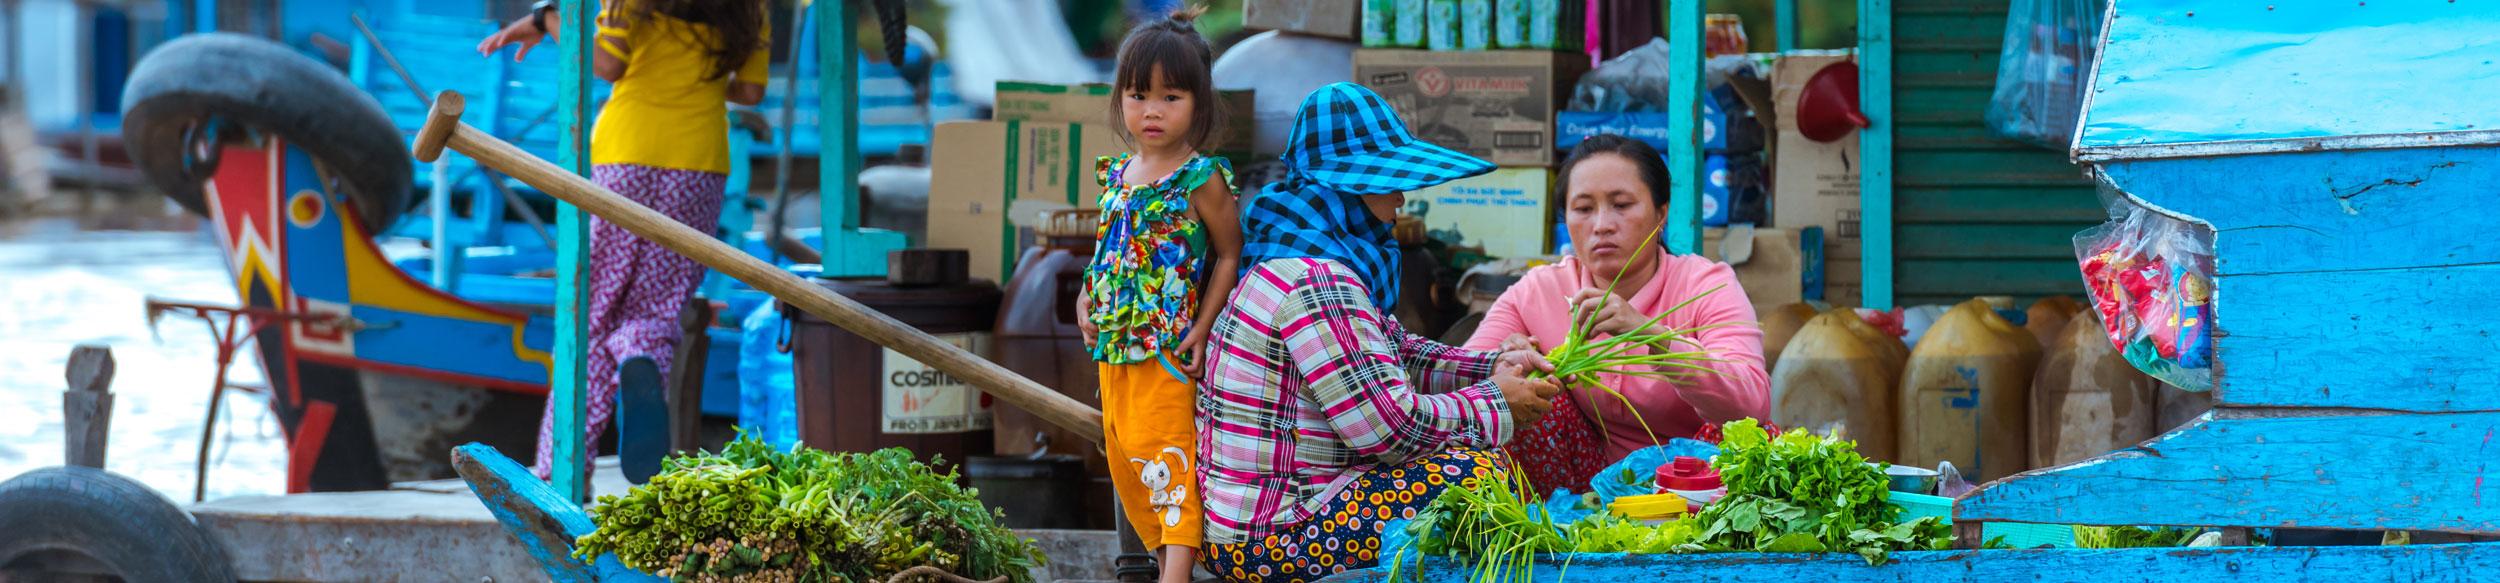 Kampong Chhnang au Cambodge avec Carnet d'Asie